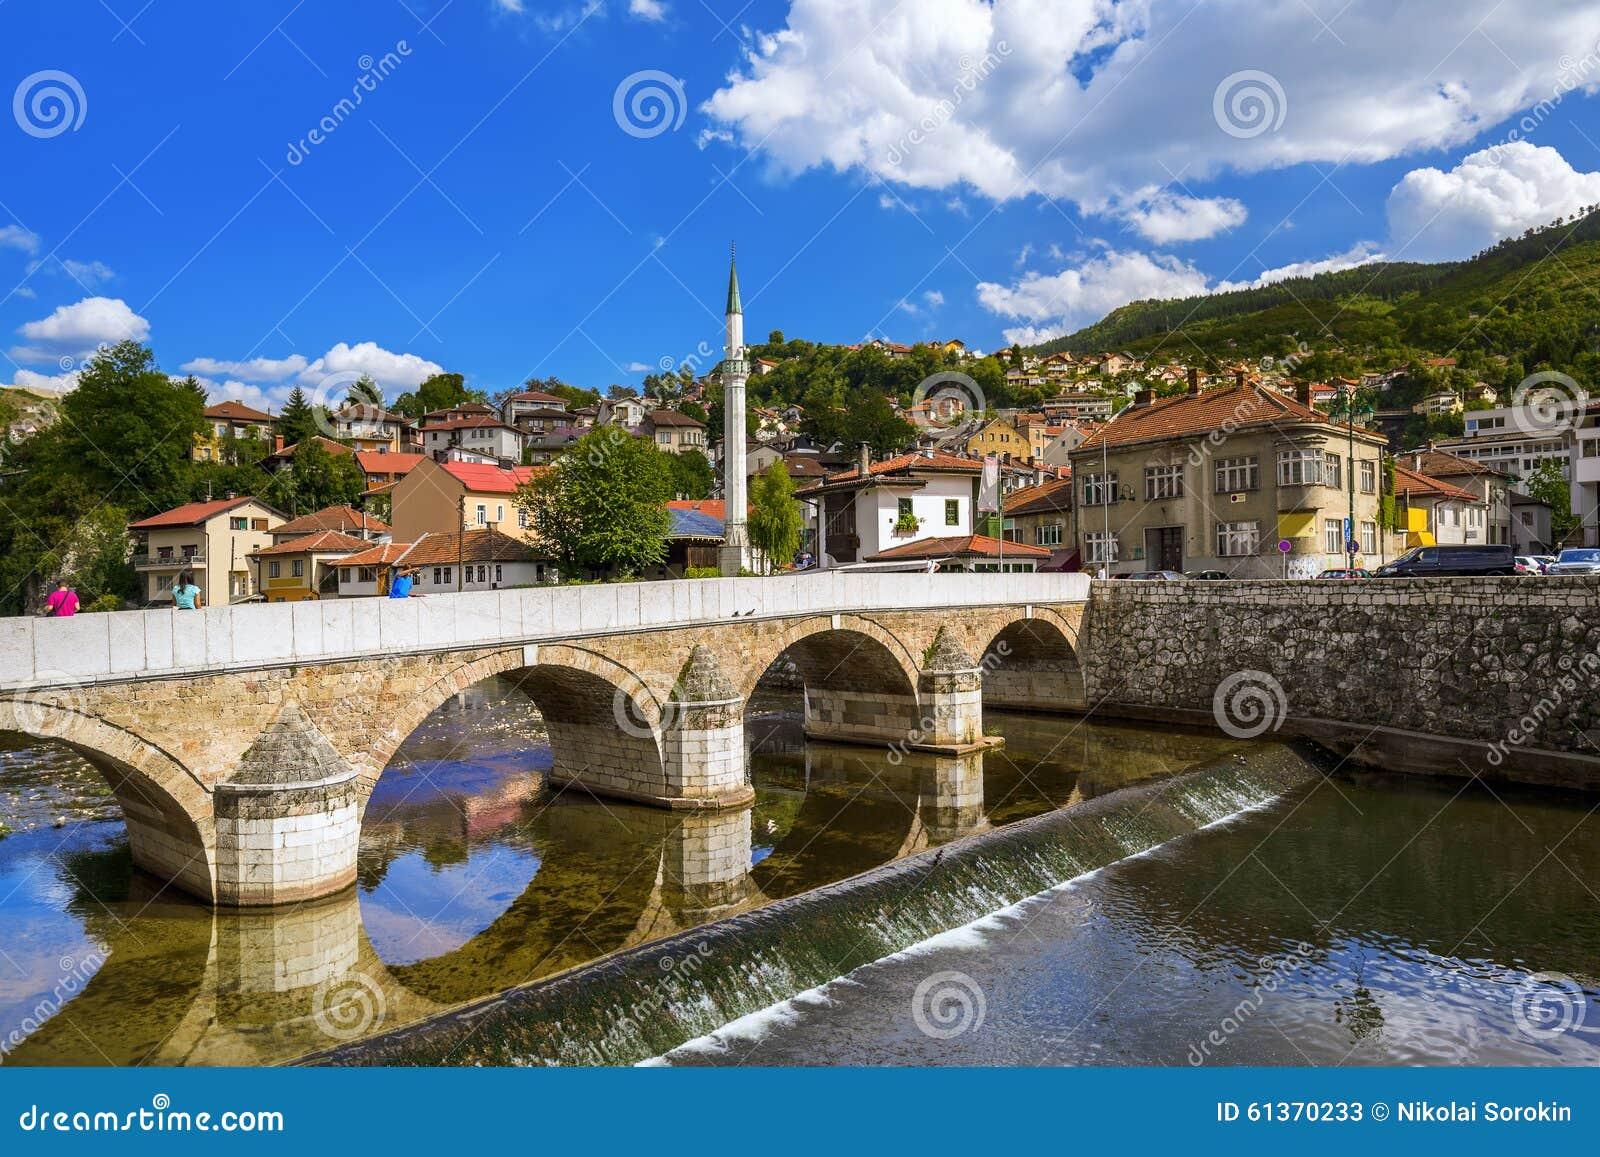 alte stadt sarajevo bosnien und herzegowina stockbild bild 61370233. Black Bedroom Furniture Sets. Home Design Ideas